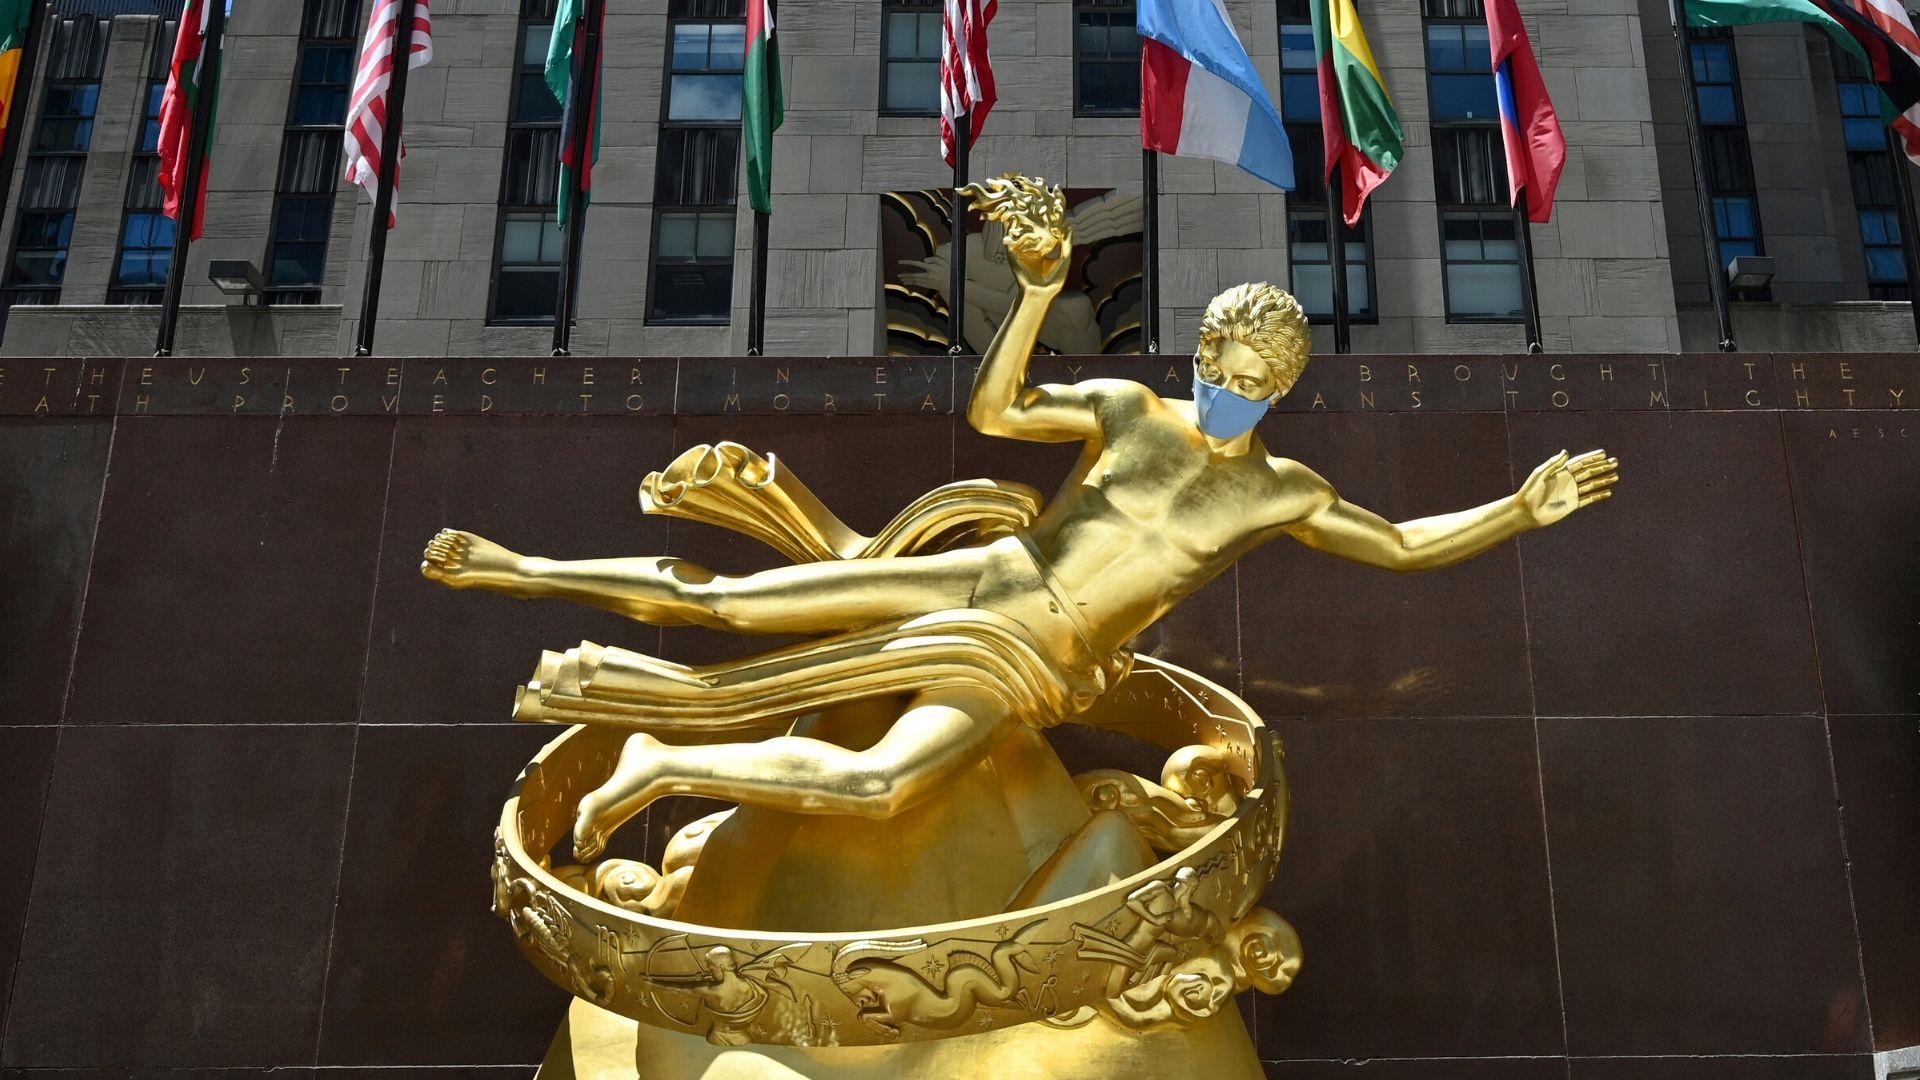 New York City reopening Phase 2 Rockefeller Center statues in masks